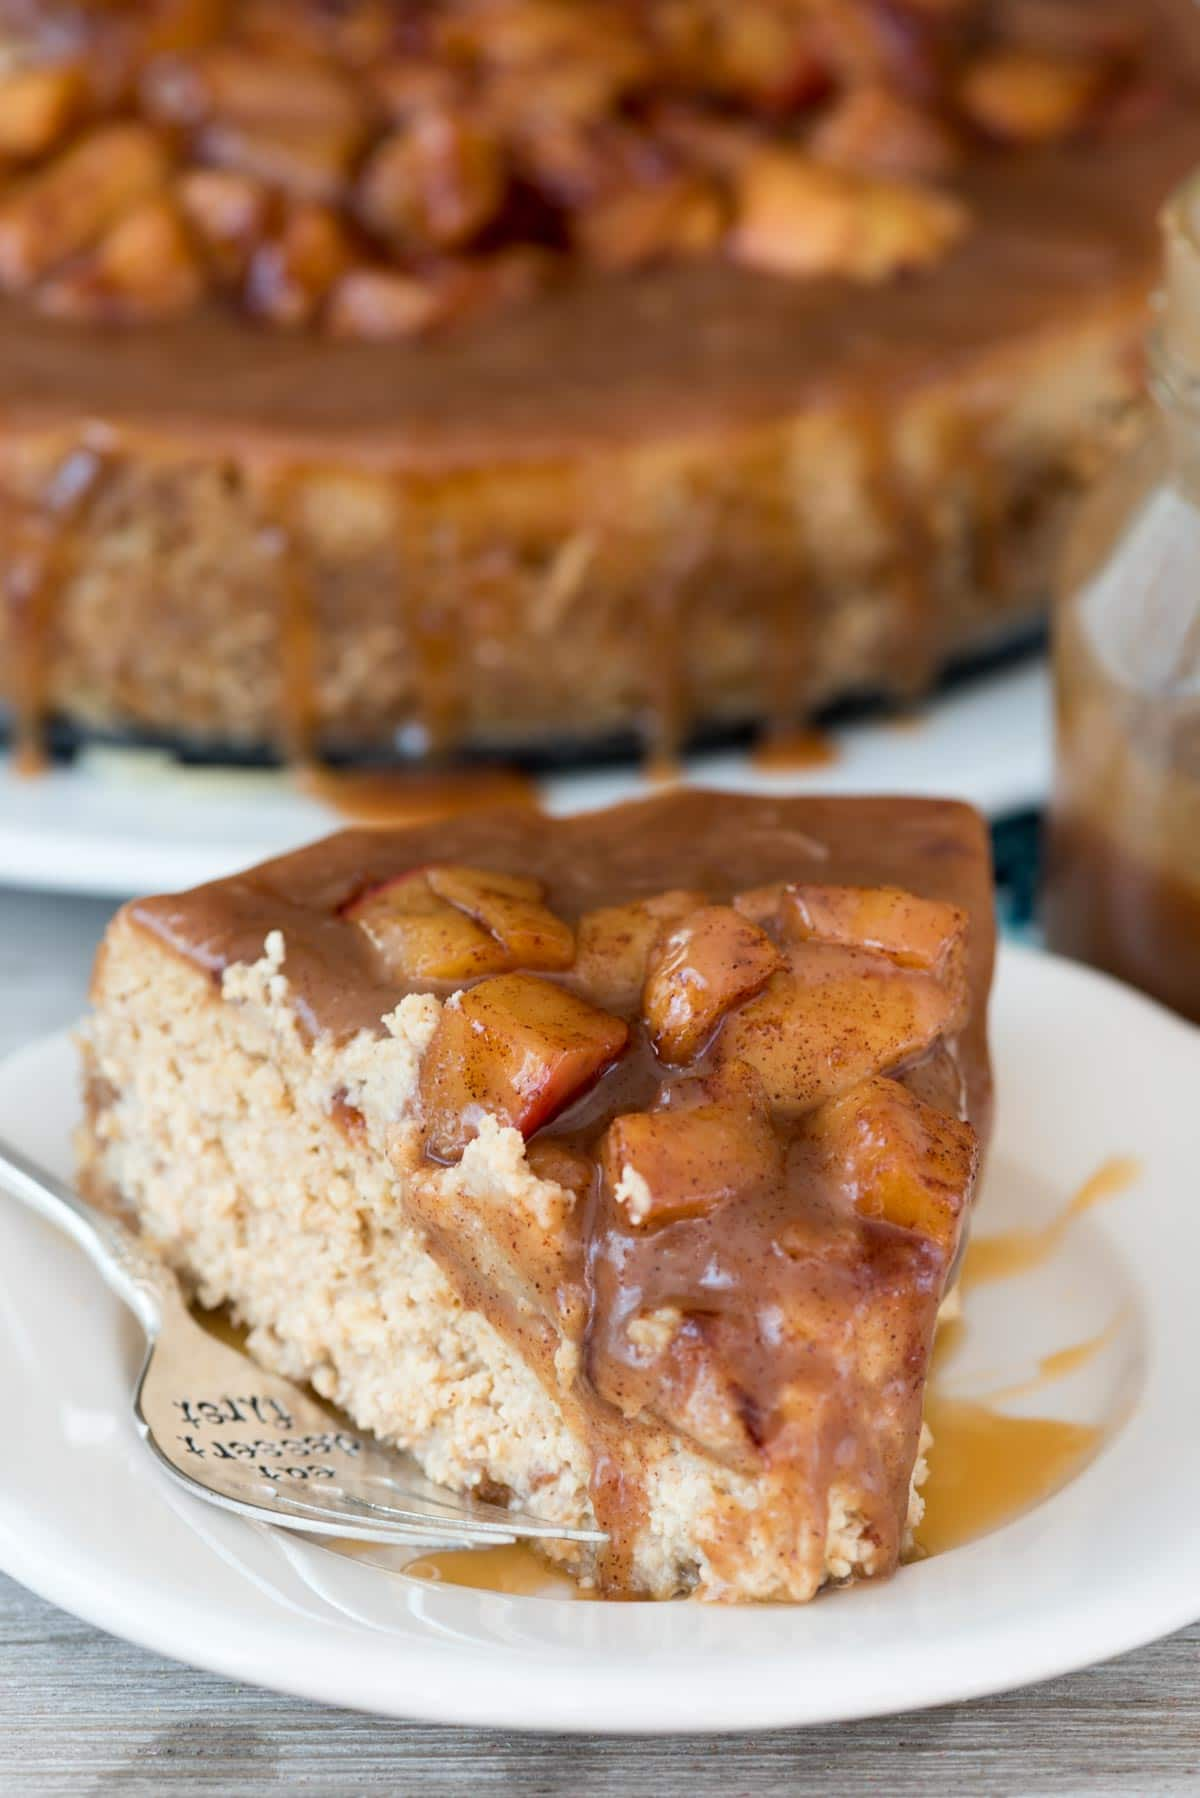 Caramel Apple Cheesecake with Nilla Wafer Crust